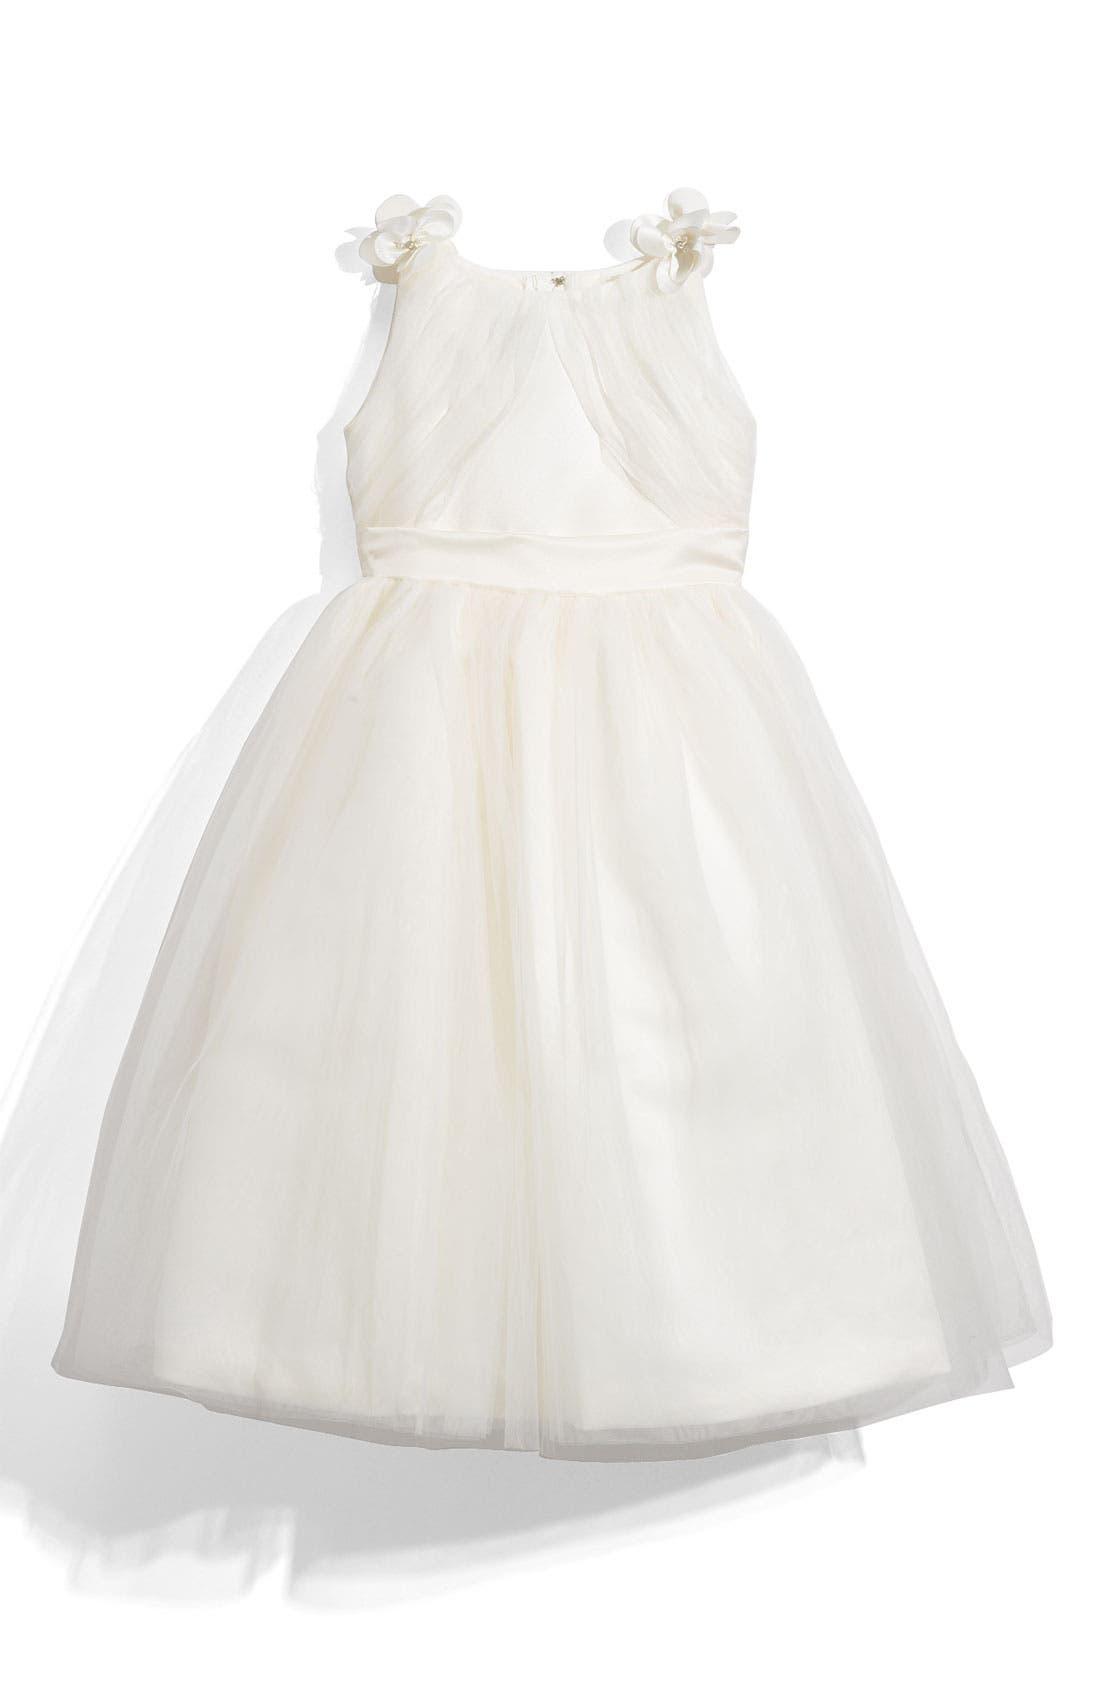 Main Image - Joan Calabrese for Mon Cheri 'Illusion' Sleeveless Satin Dress (Little Girls & Big Girls)